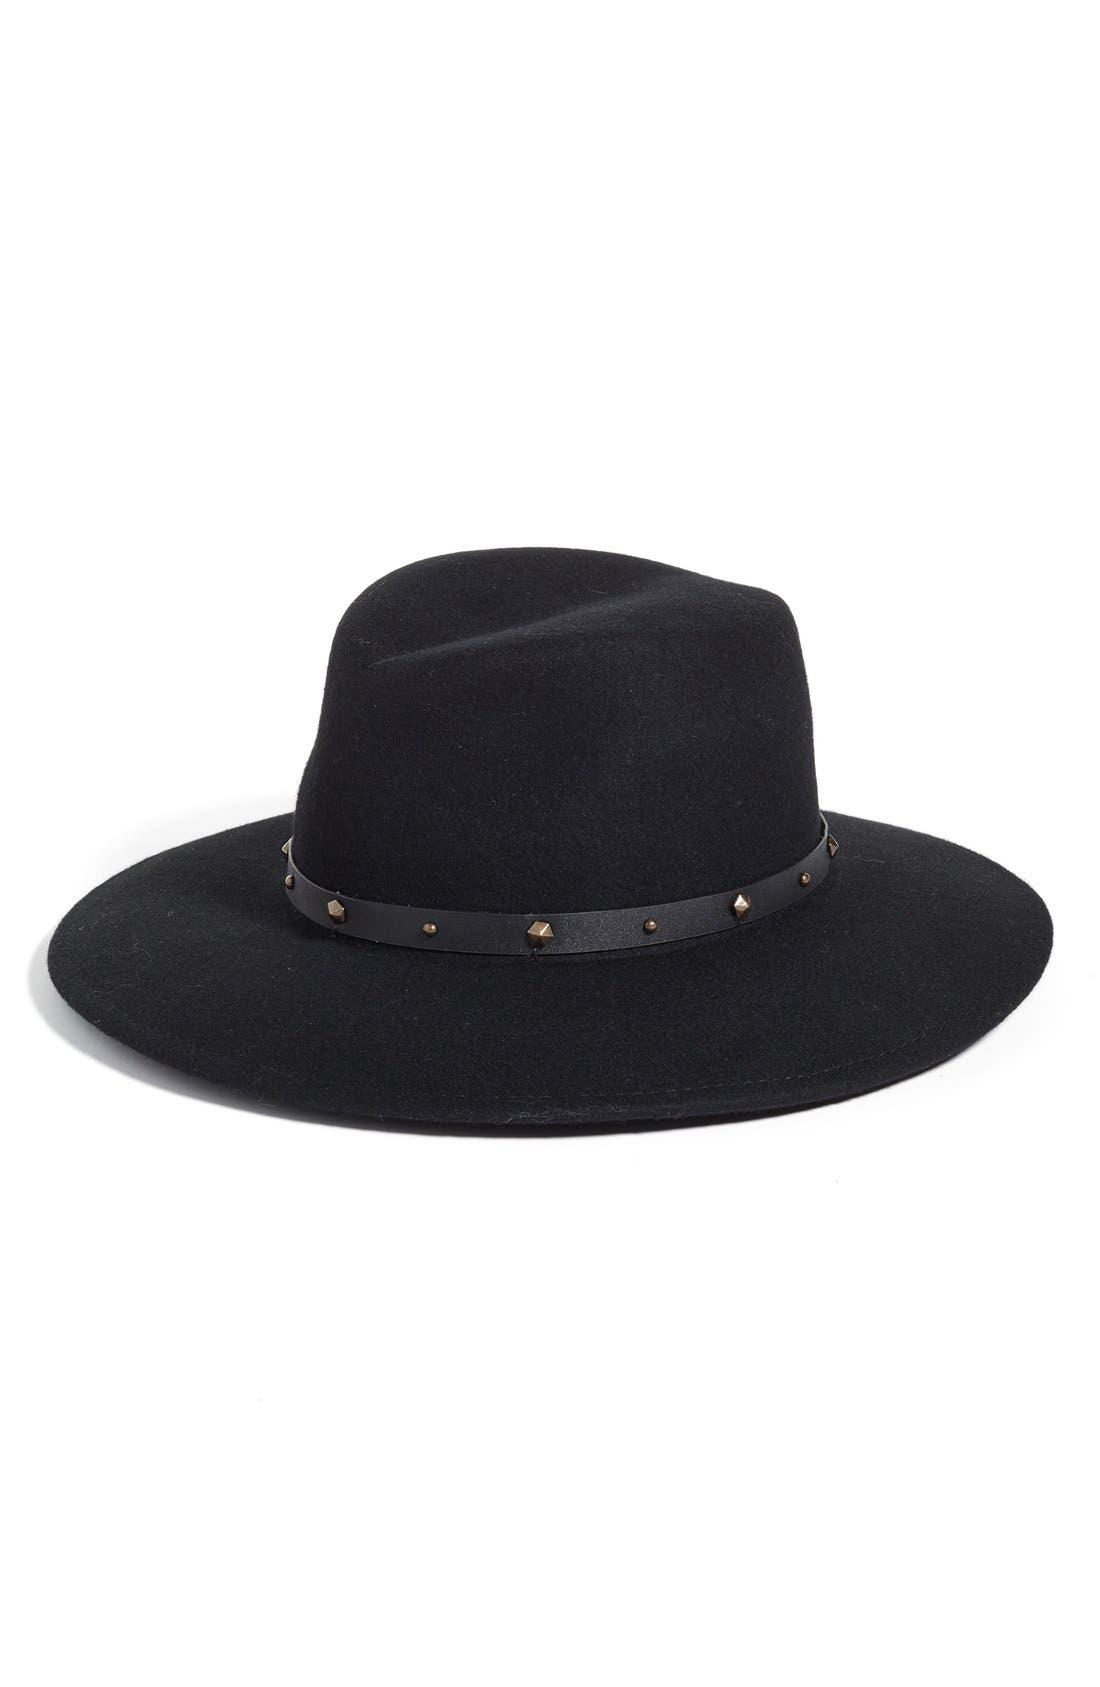 Karli Wool Felt Wide Brim Hat,                             Main thumbnail 1, color,                             001